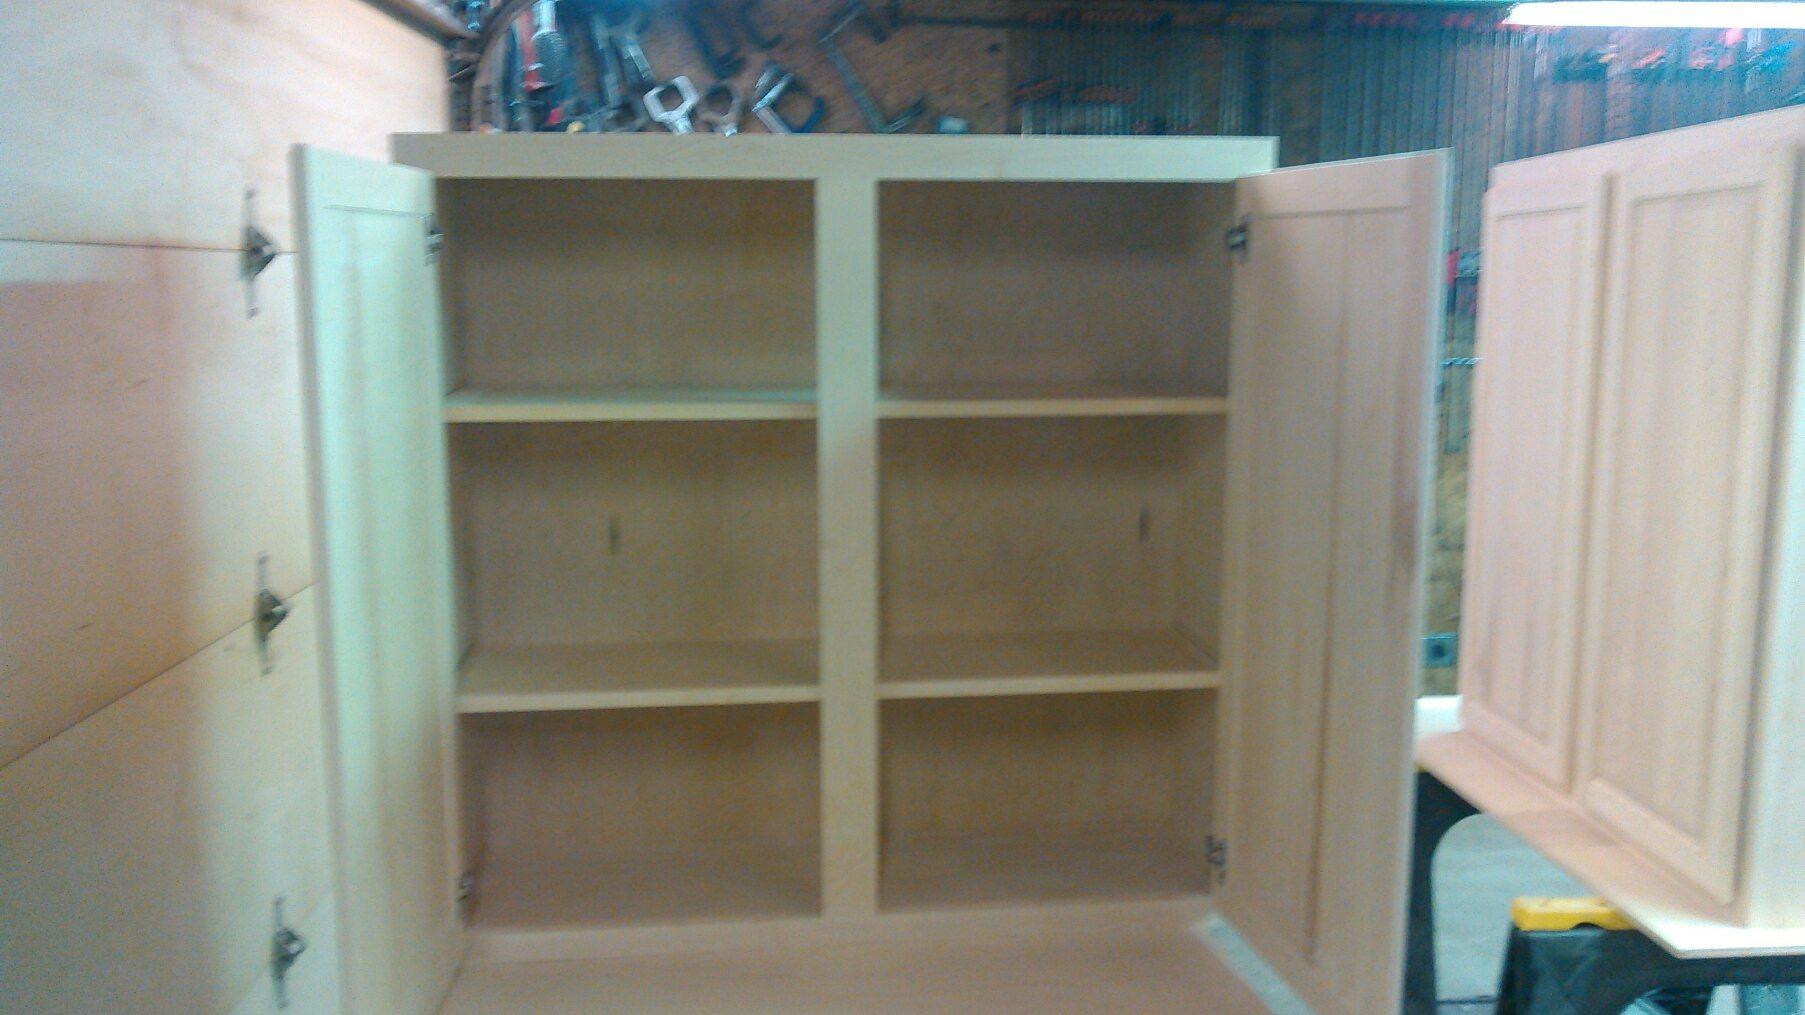 Kcraft Welding & Woodworking image 6